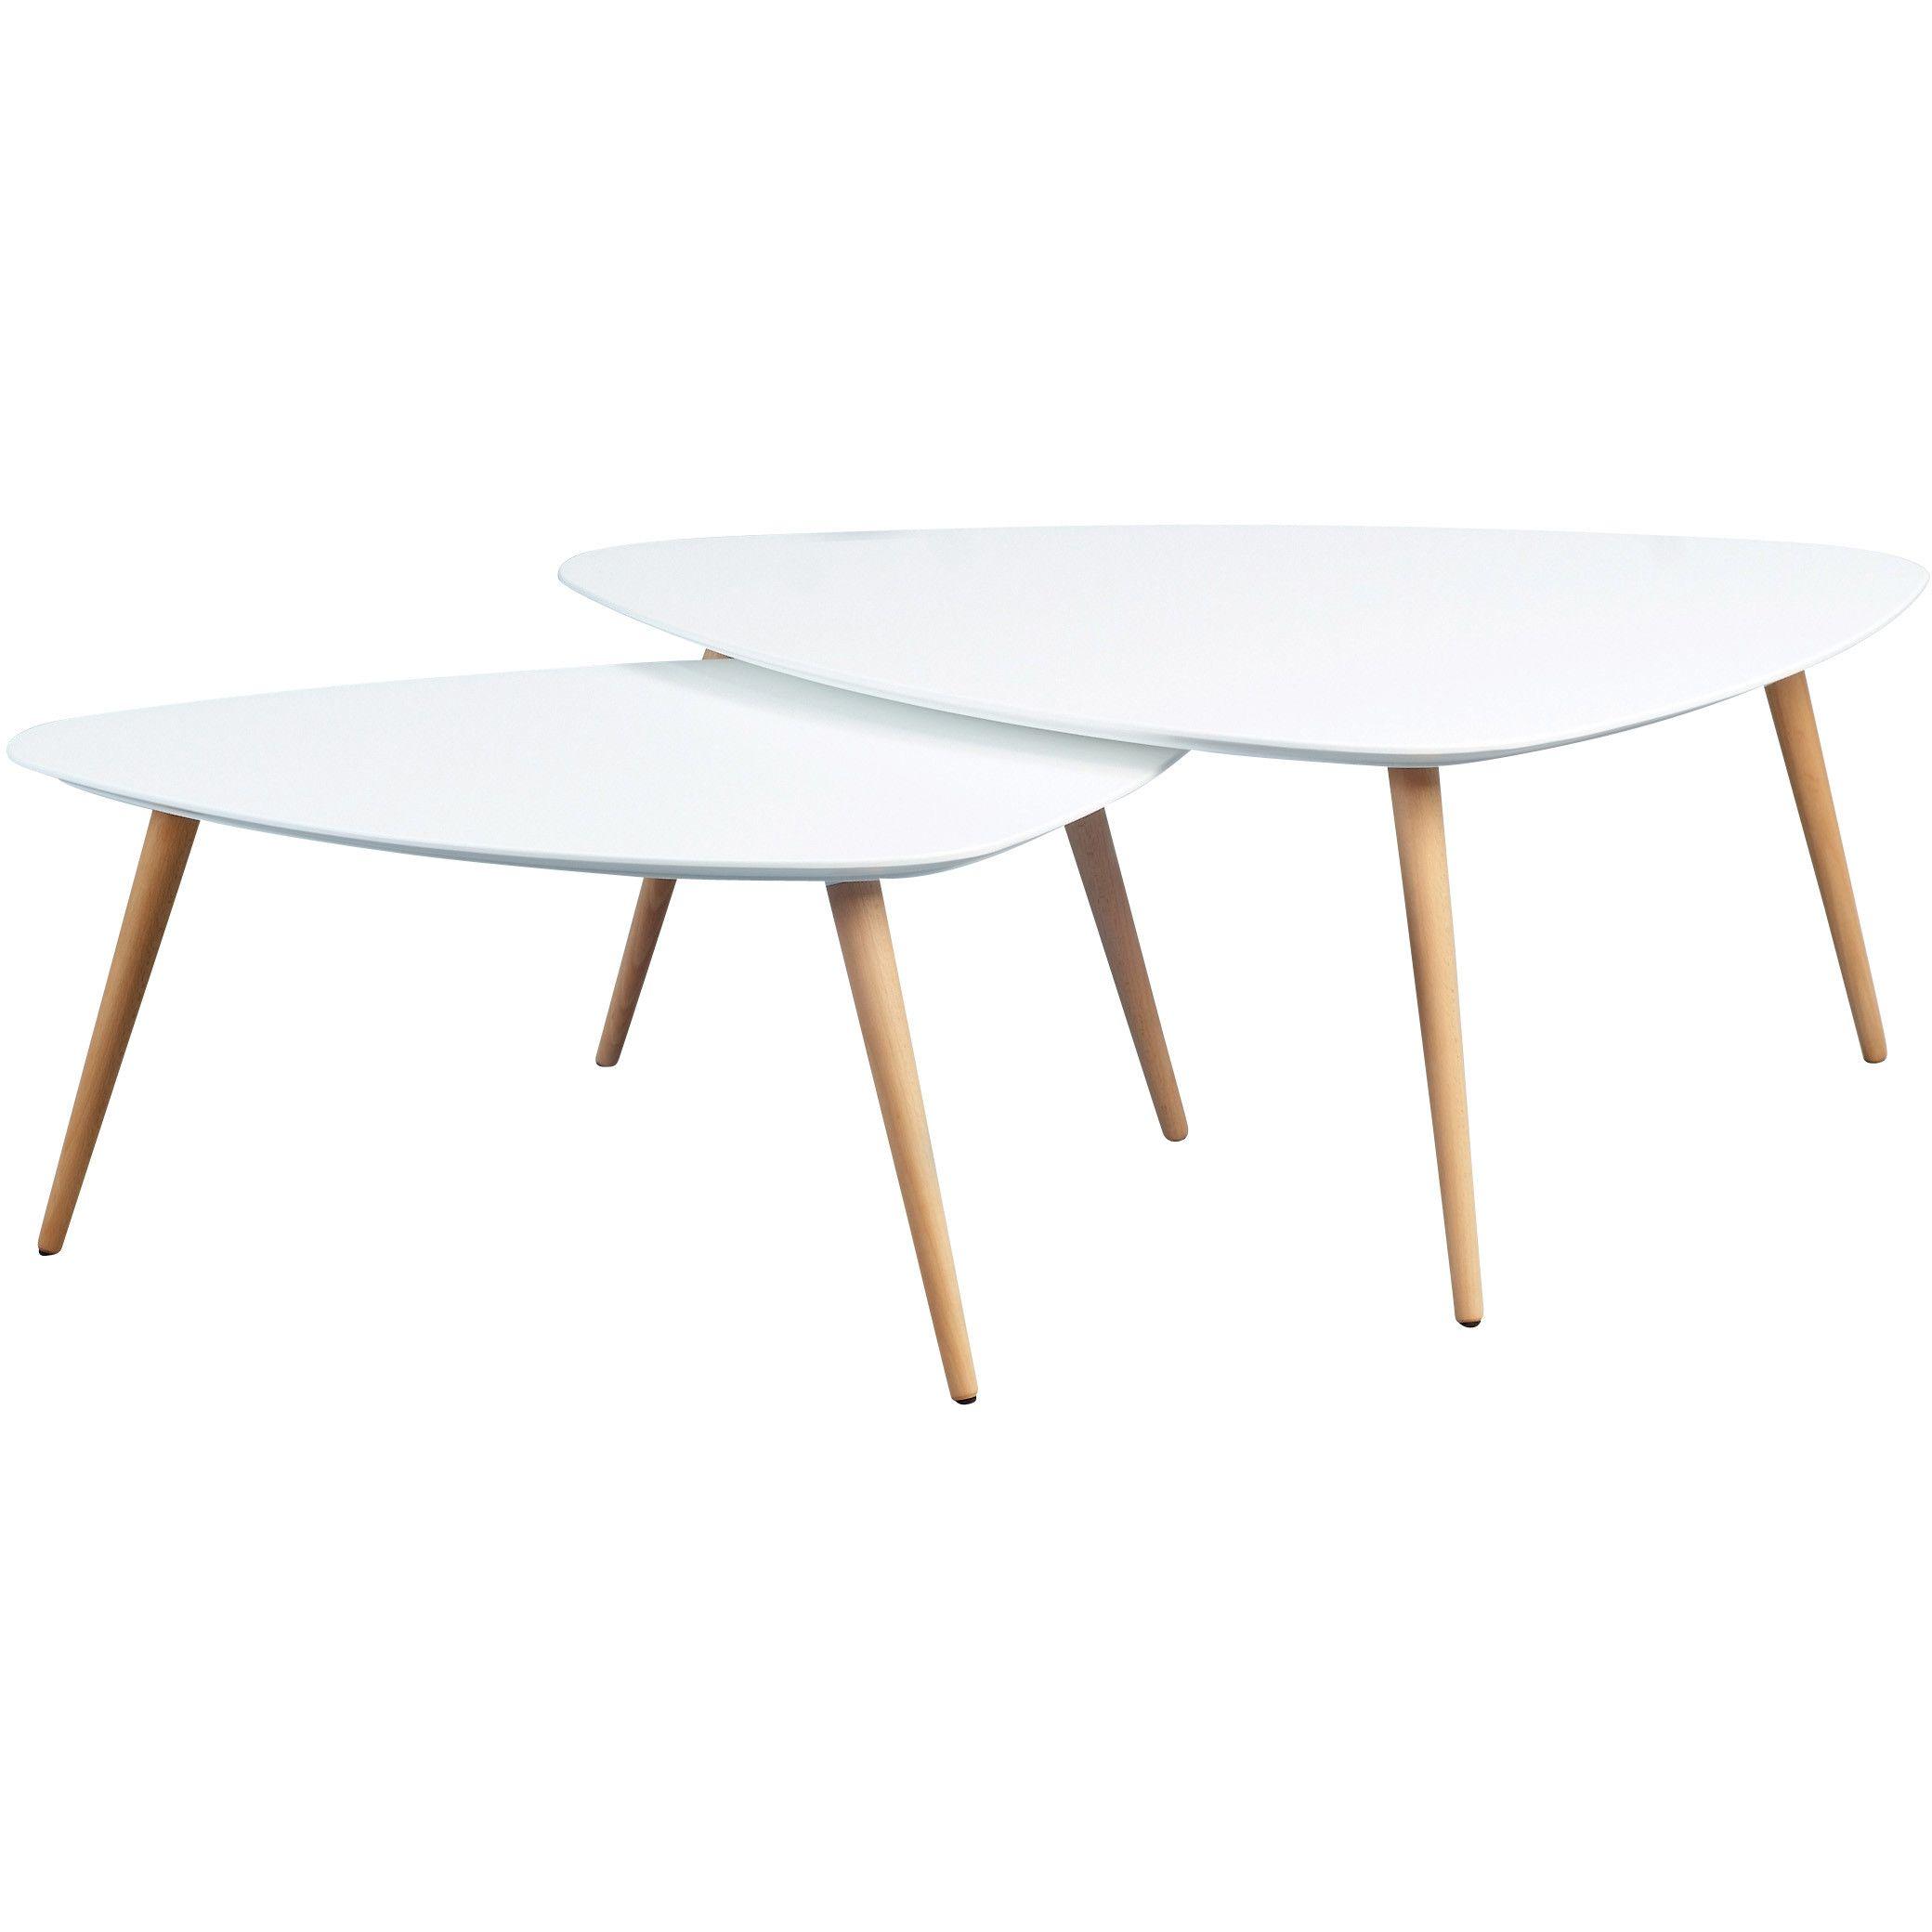 Tenzin 2 Piece Coffee Table Set Coffee tables uk, Table